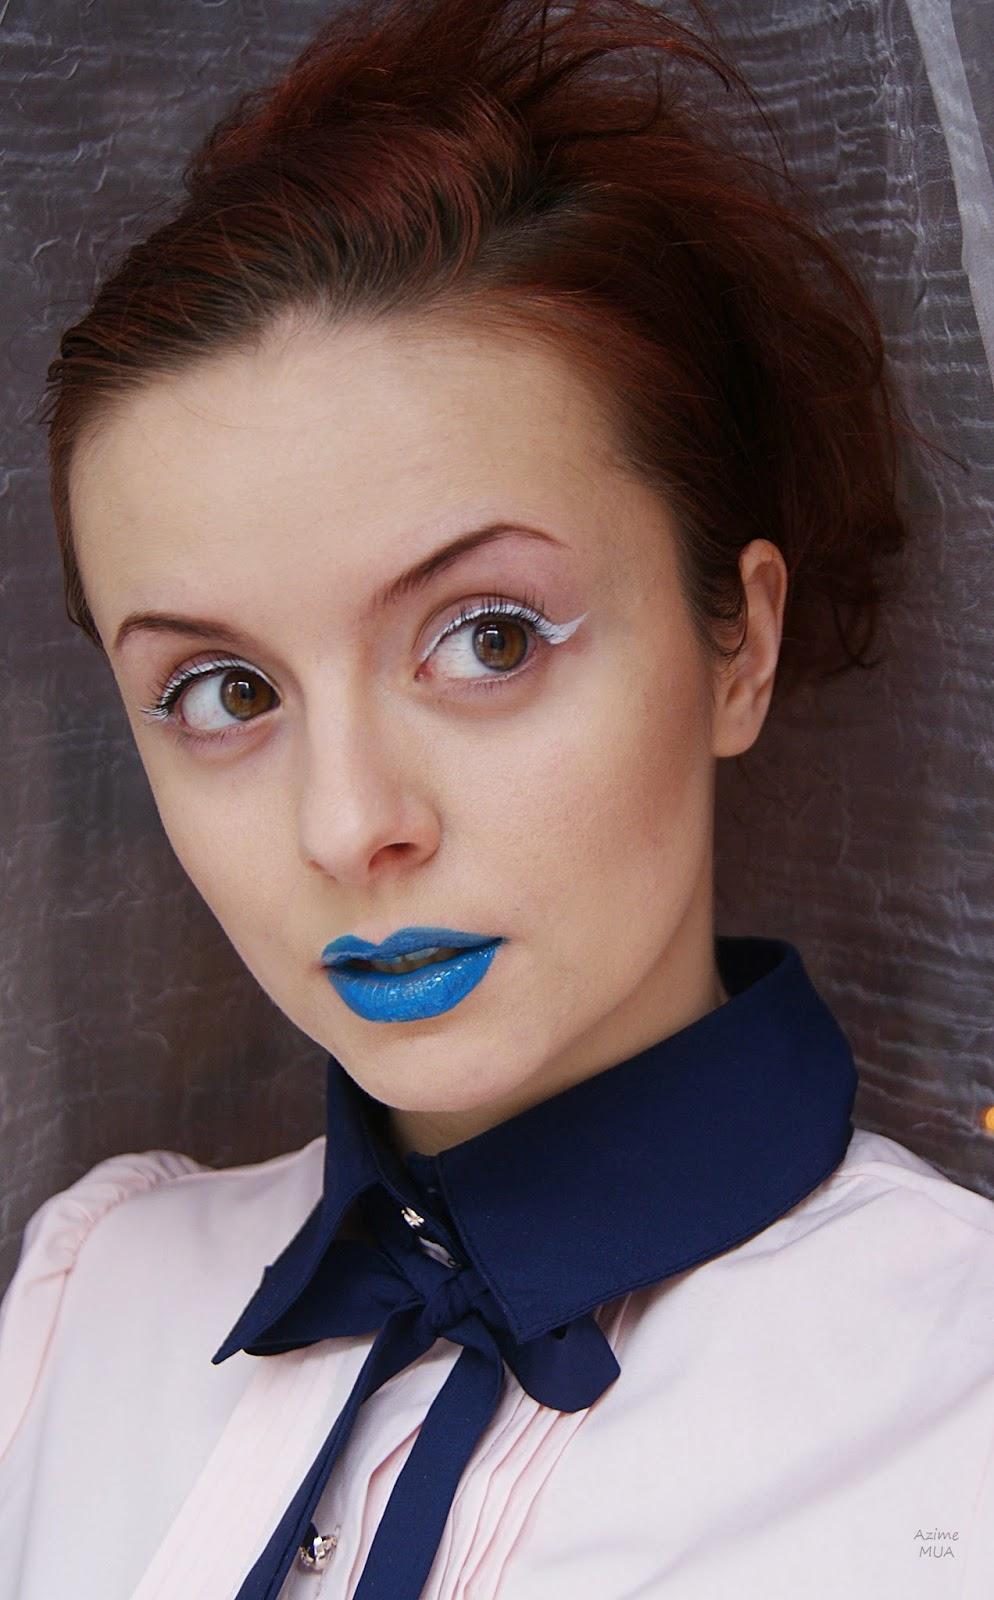 [179.] Negative make up